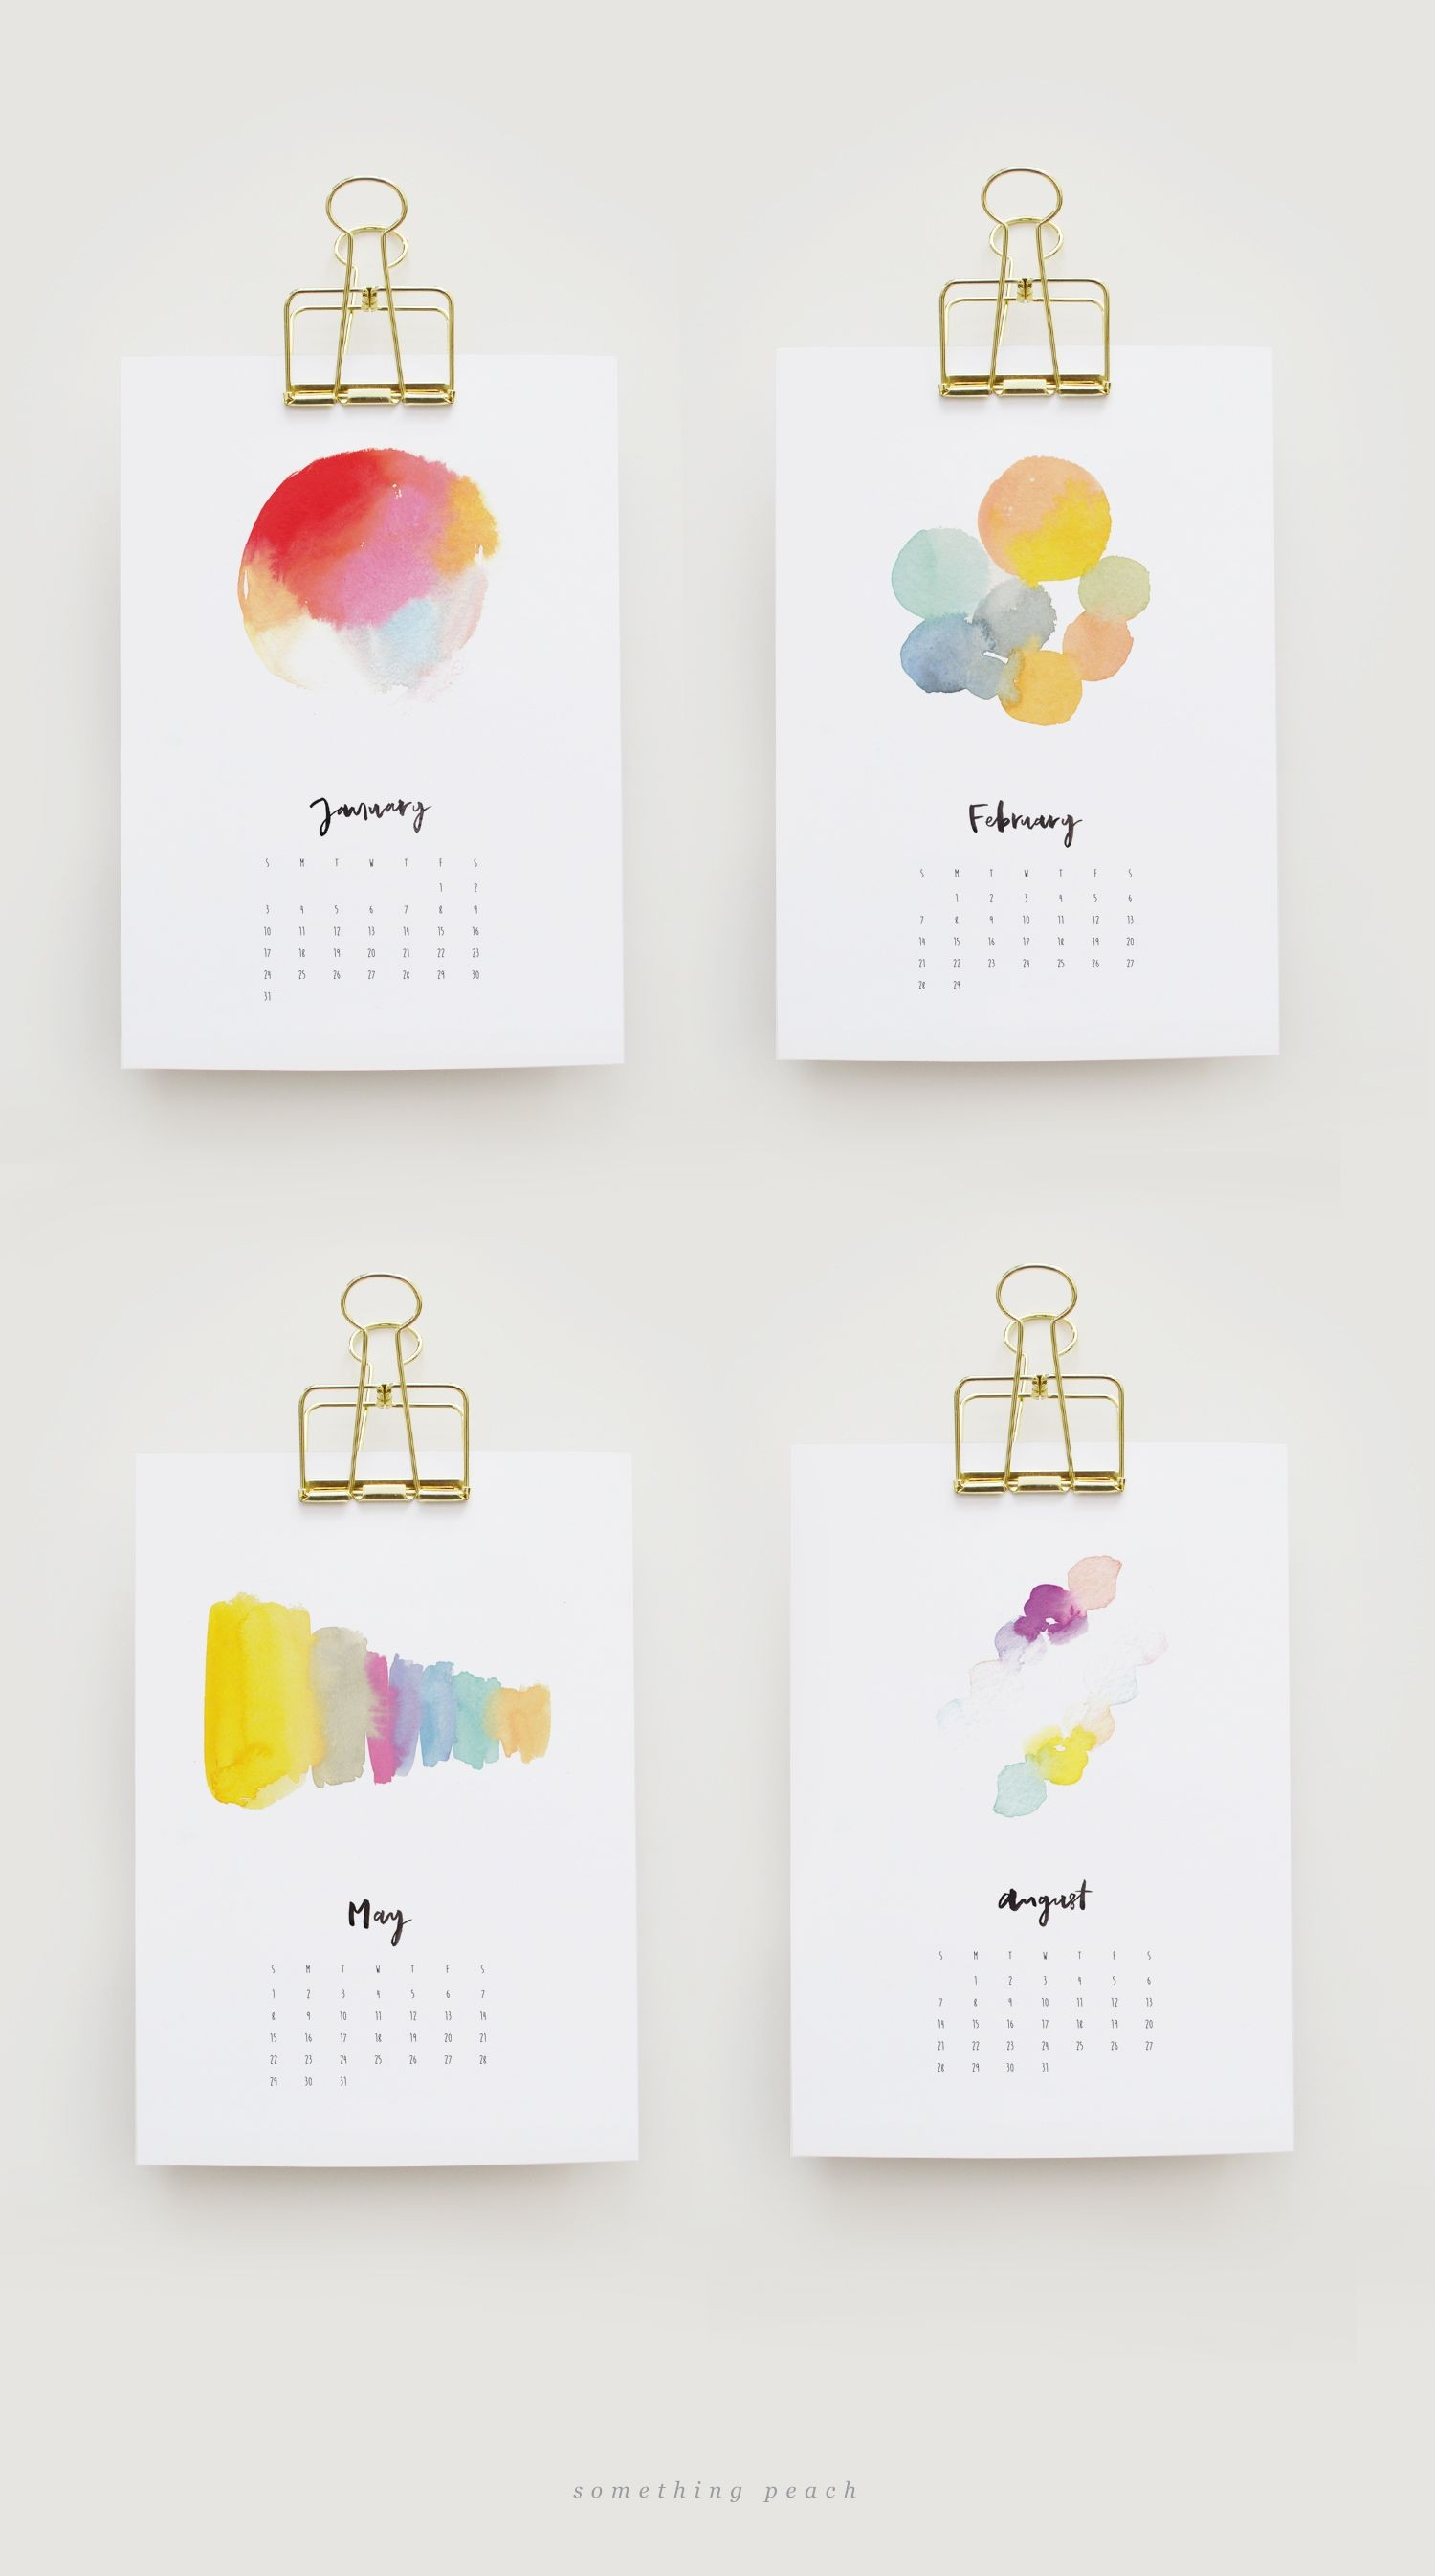 somethingpeach free printable 2016 watercolour calendar 03 Free Printable Calendar 2016 2016 Calender